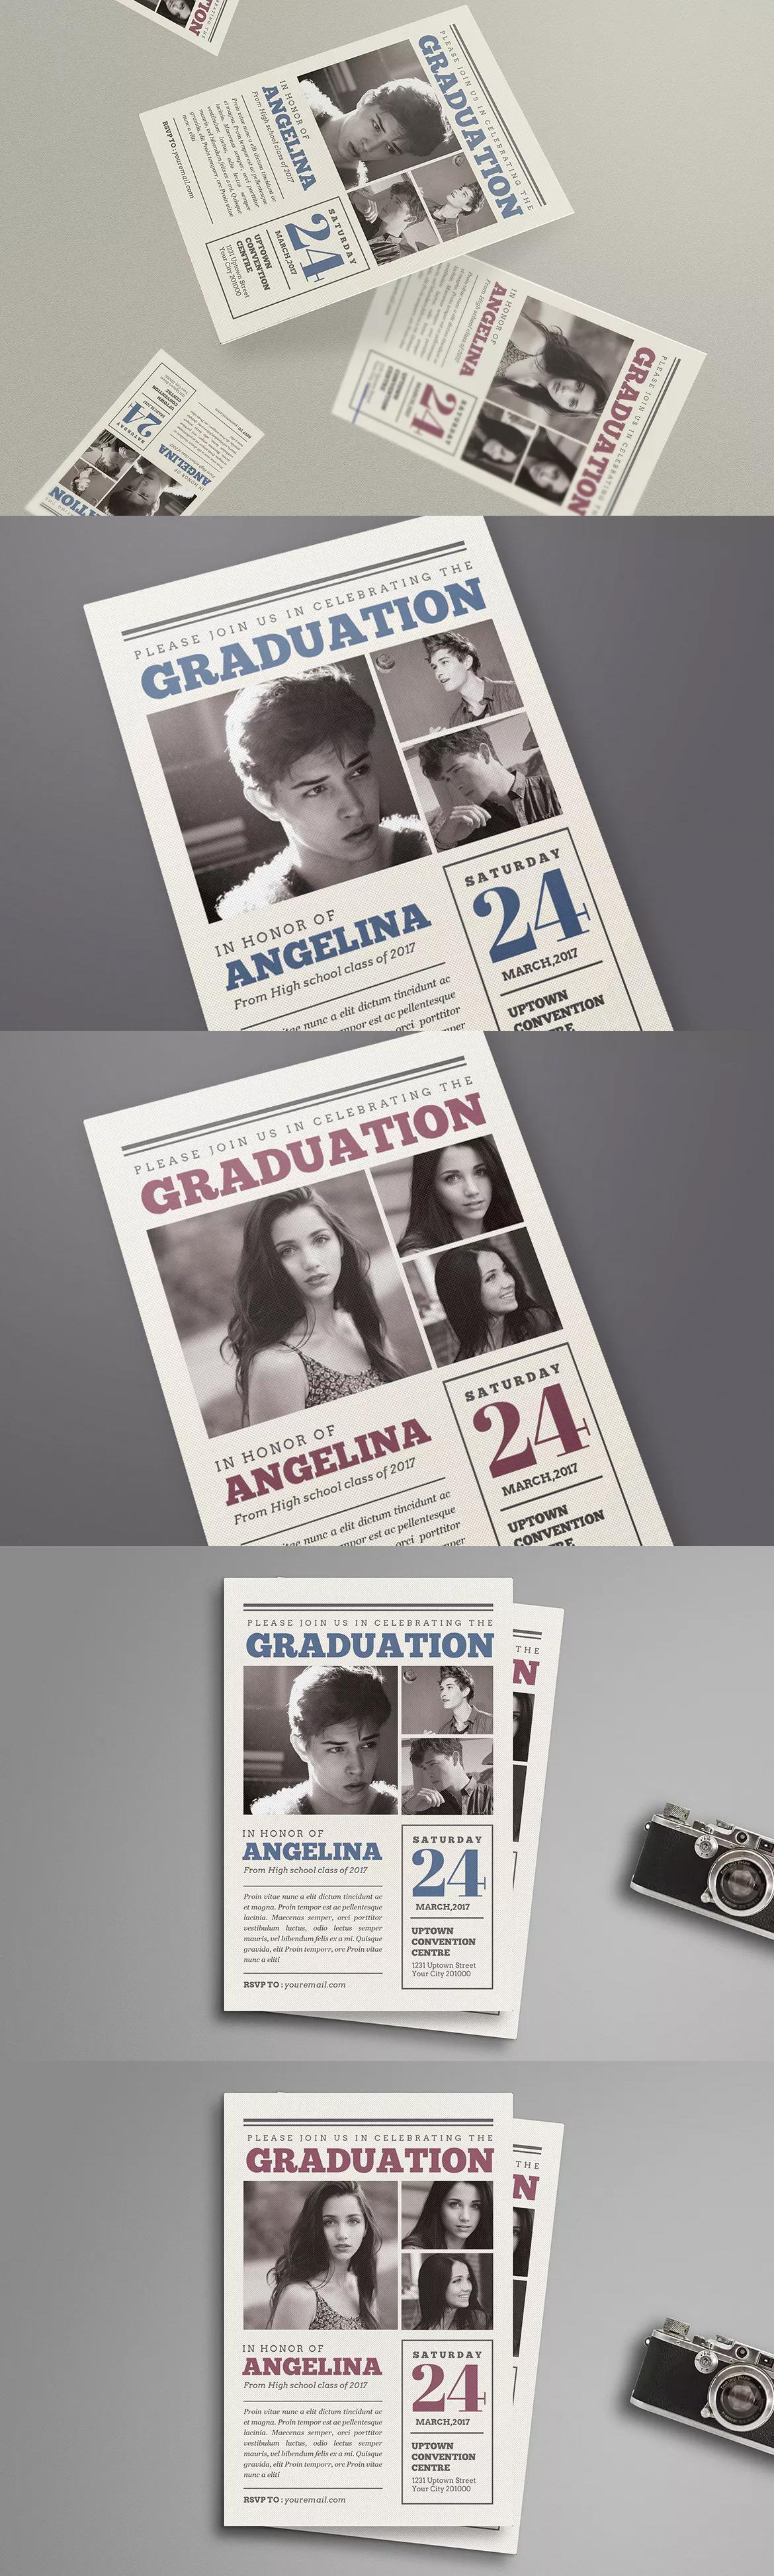 Newspaper Style Graduation Invitation Template PSD | Invitation Card ...